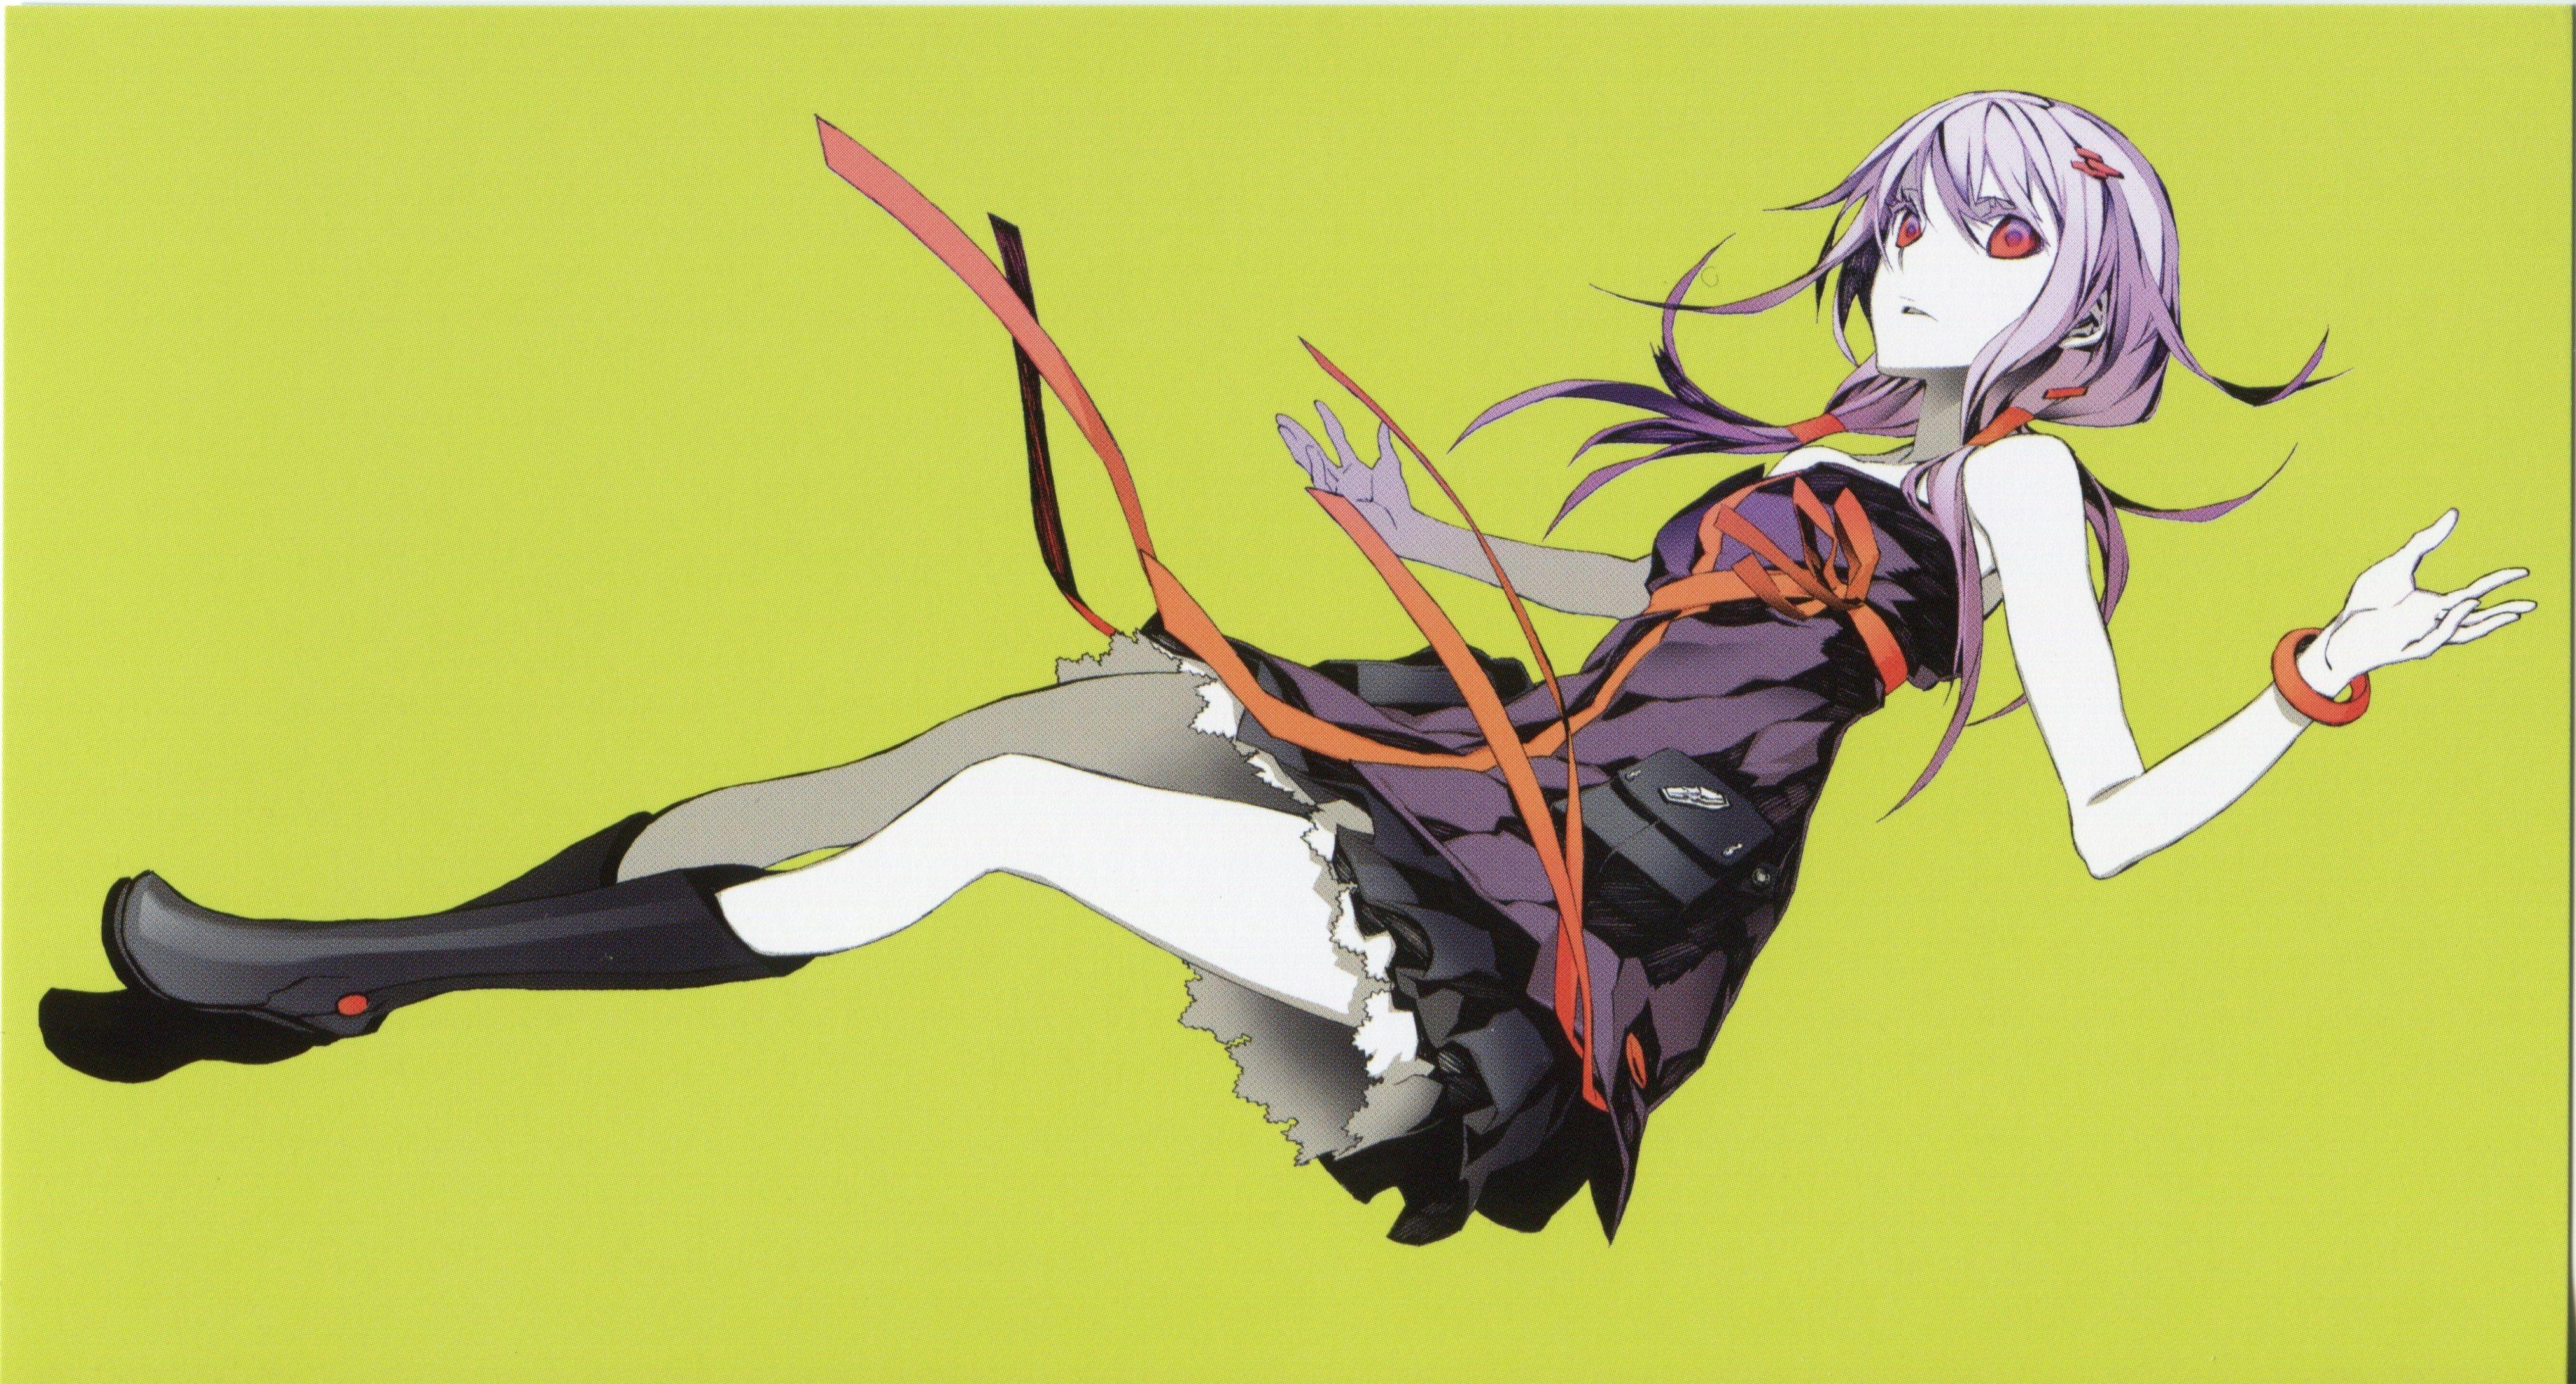 Anime Guilty Crown Anime Inori Yuzuriha Shu Ouma Wallpaper